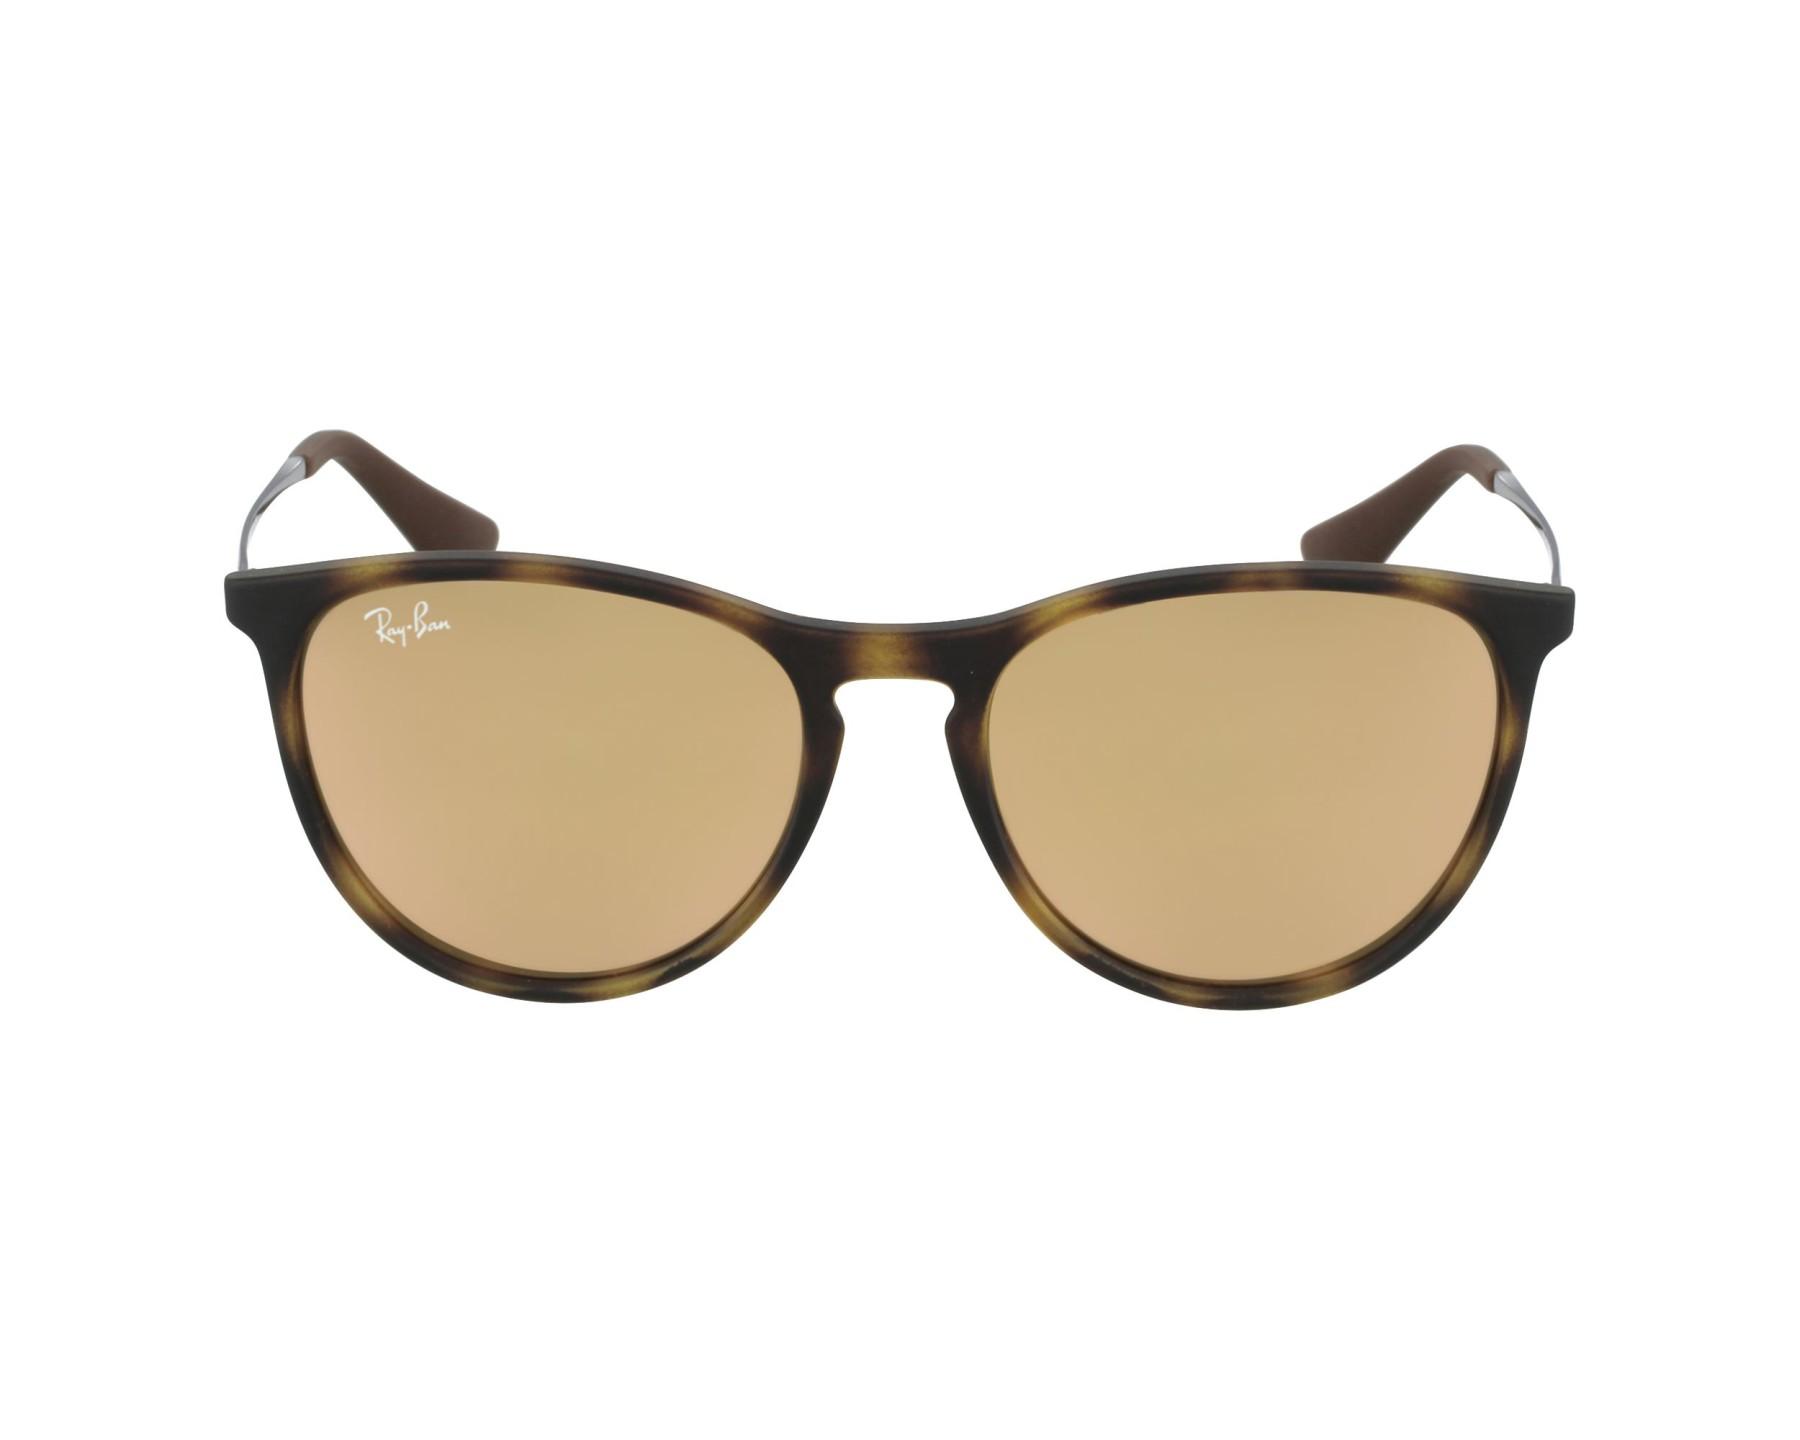 076d9acc96 Oakley Whisker 6b Eyeglasses Frame Pewter Color 55mm - Hibernian ...